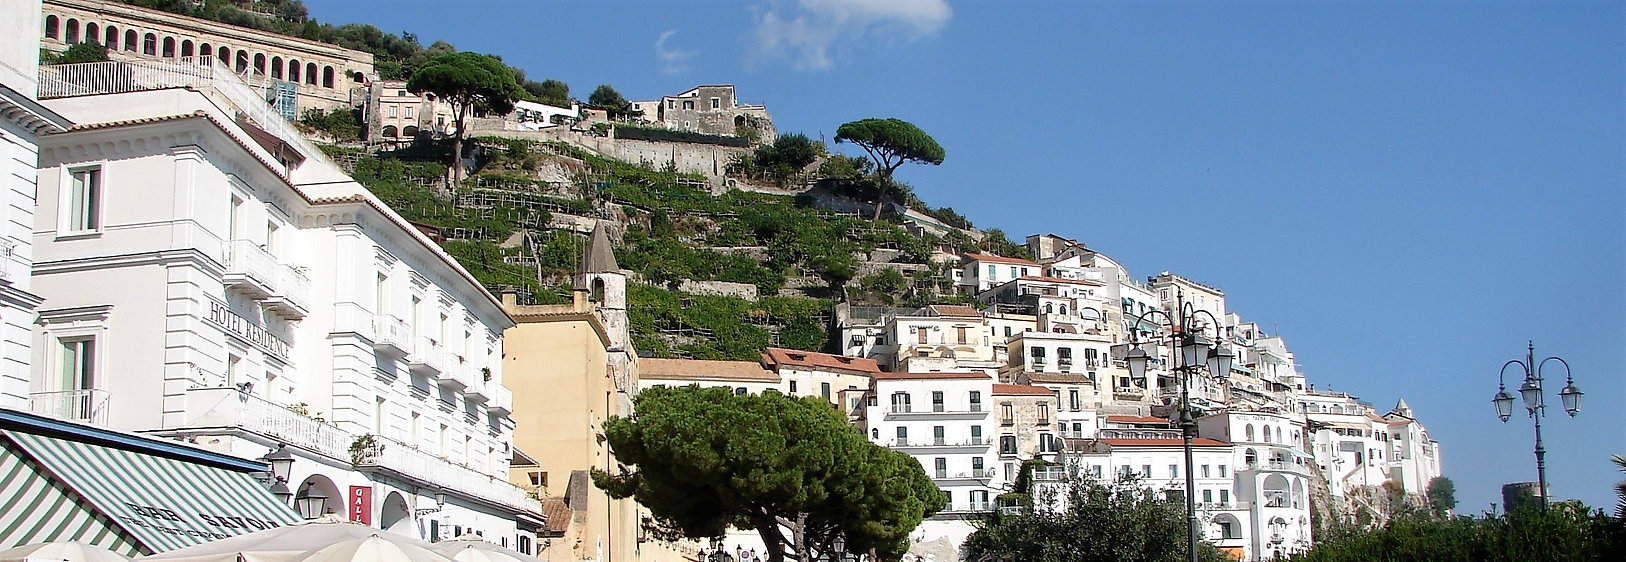 waterfront street Amalfi.jpg